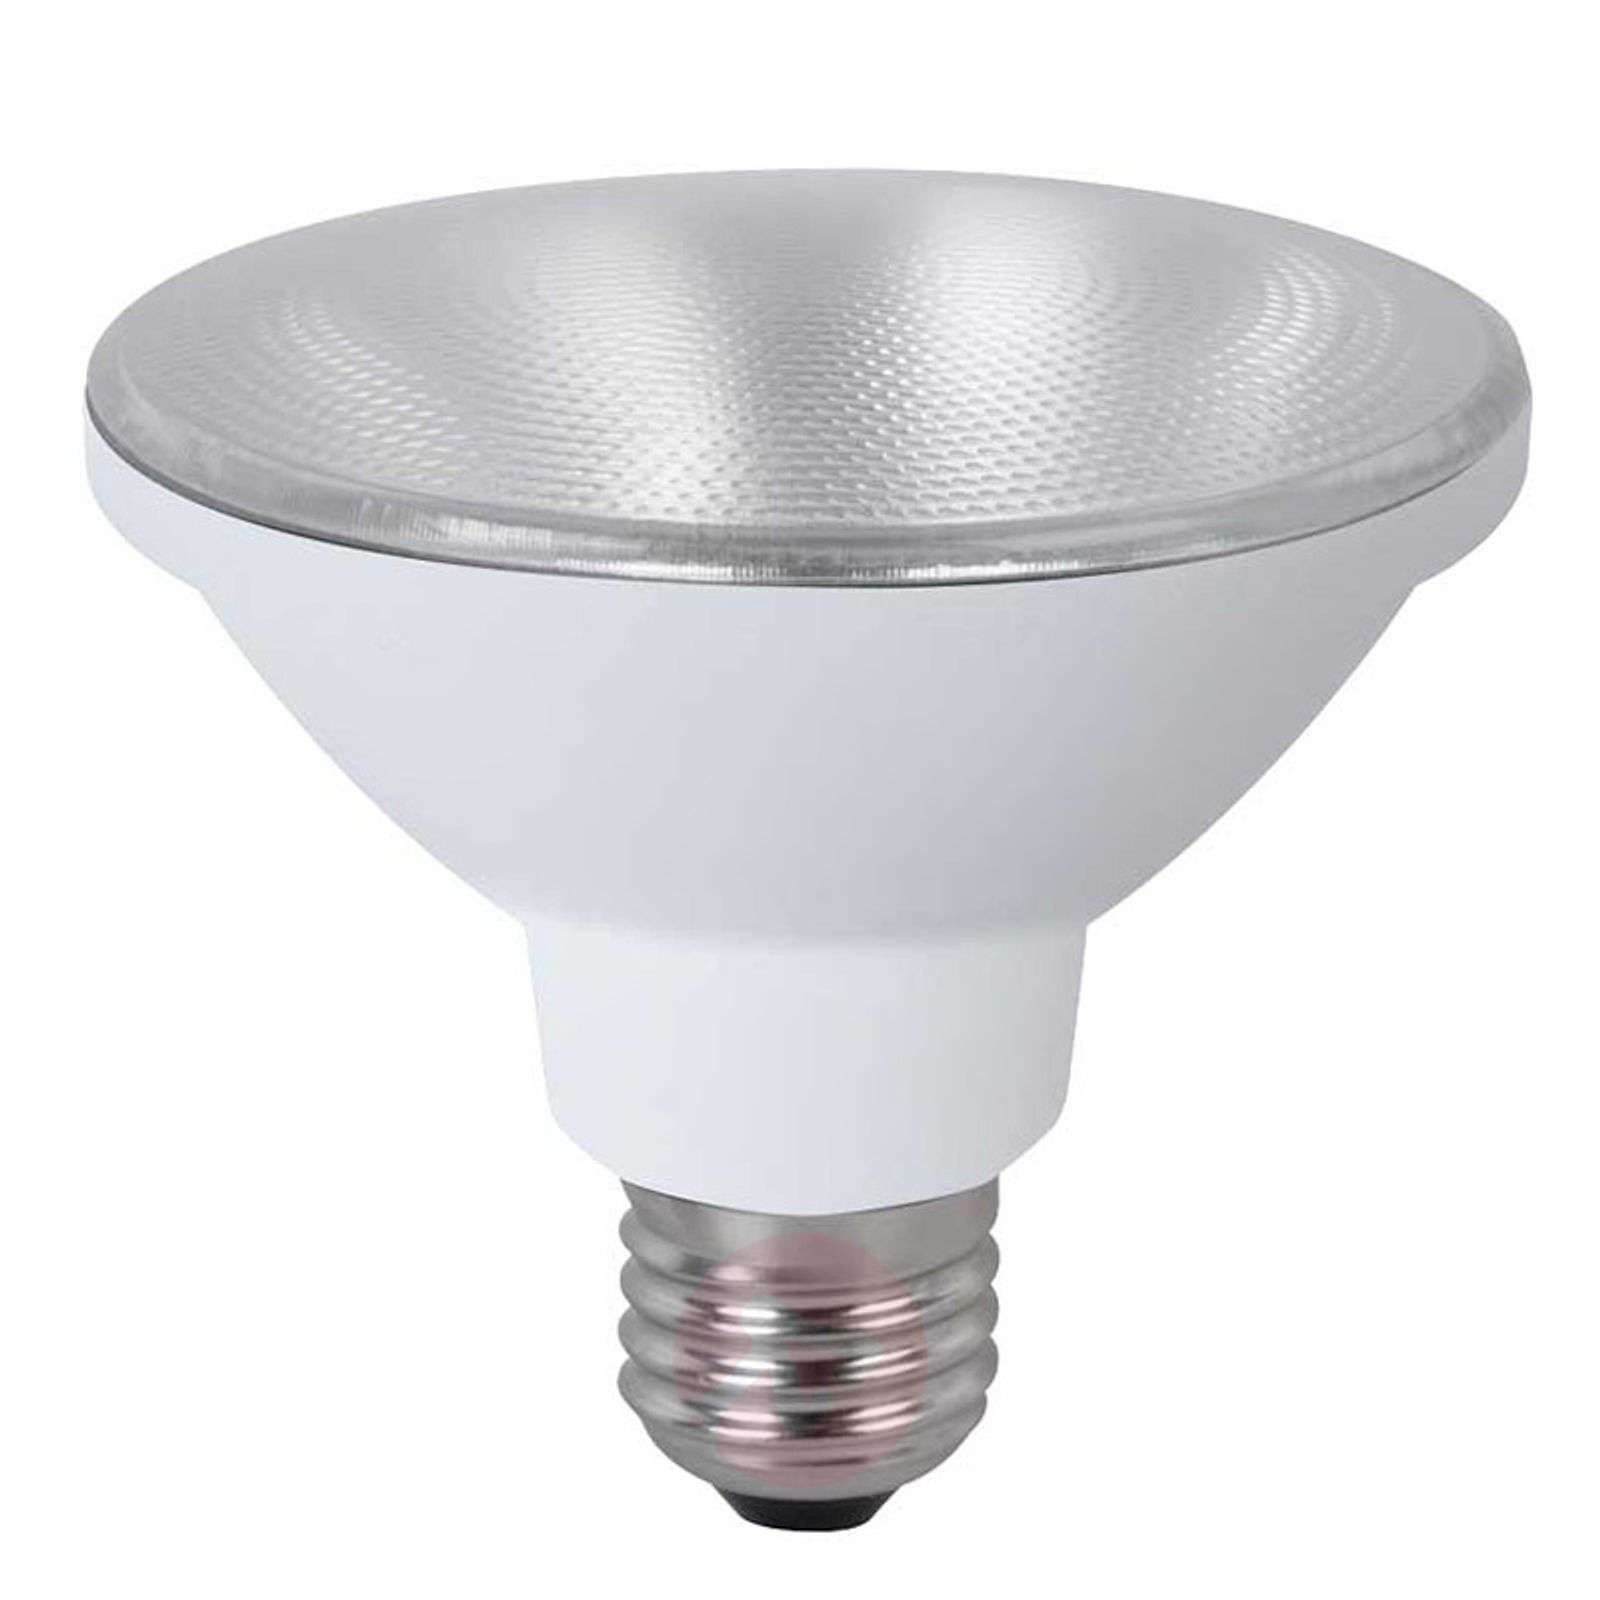 E27 10.5W LED reflector MEGAMAN PAR30 35degree-6530187-01